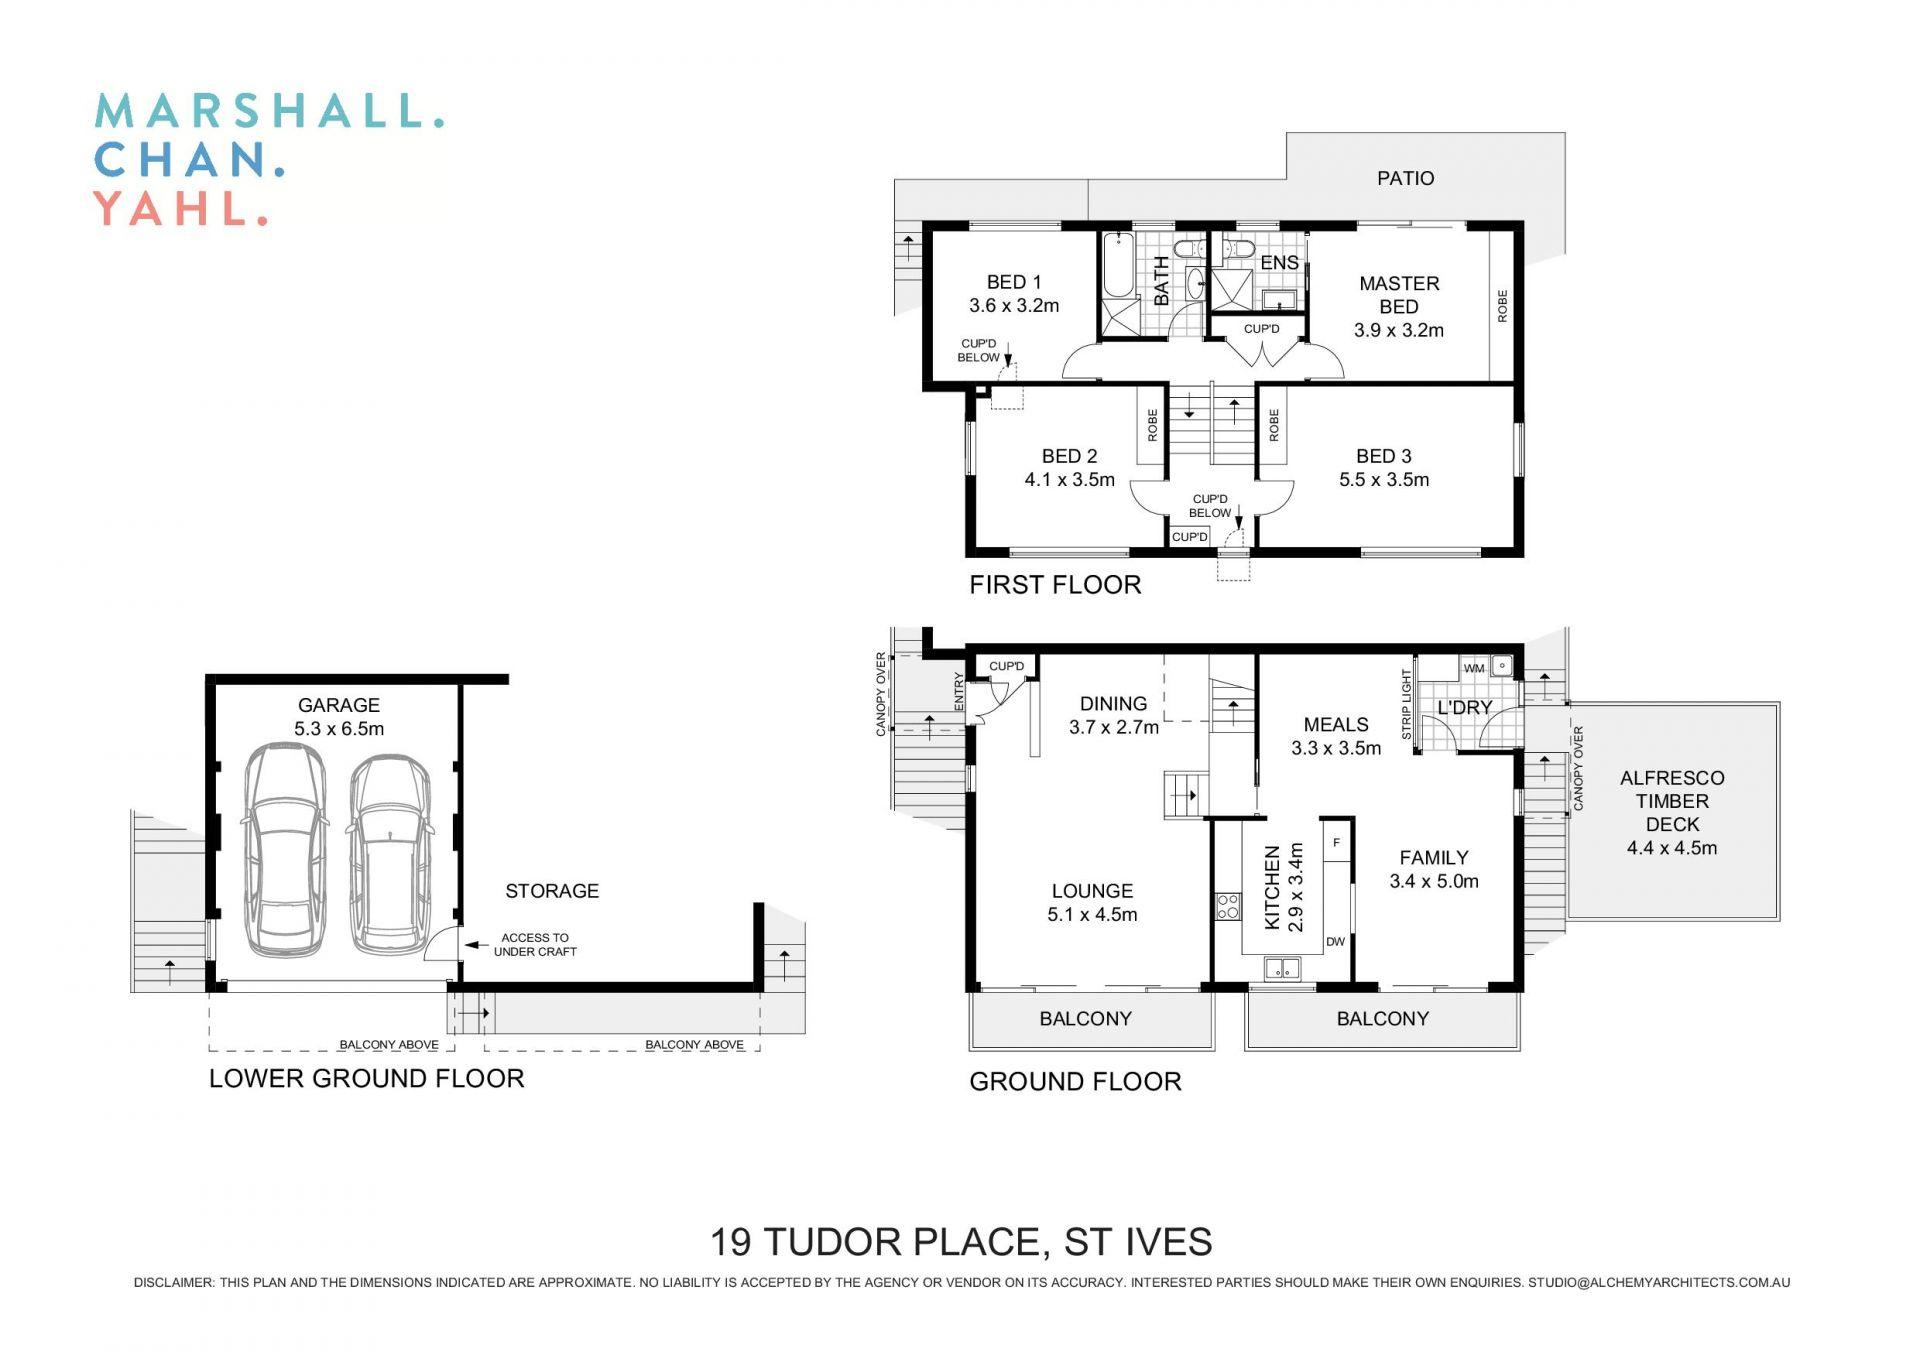 19 Tudor Place St Ives 2075